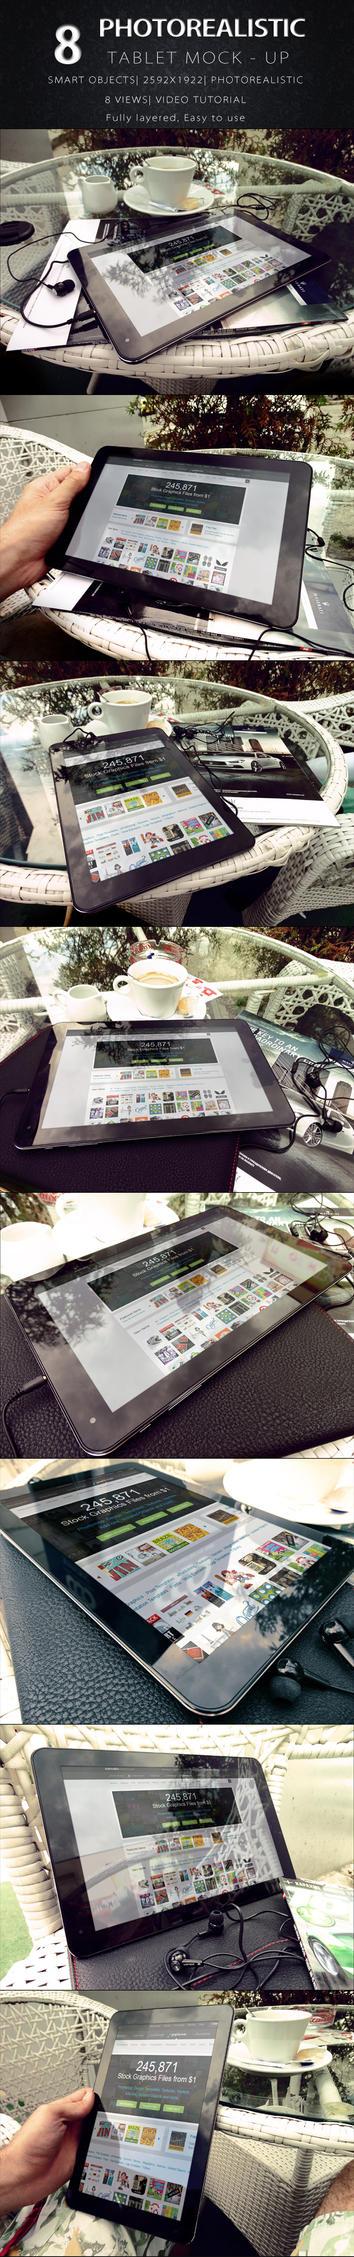 Photorealistic Tablet Mock Up V.2 by KILVAM